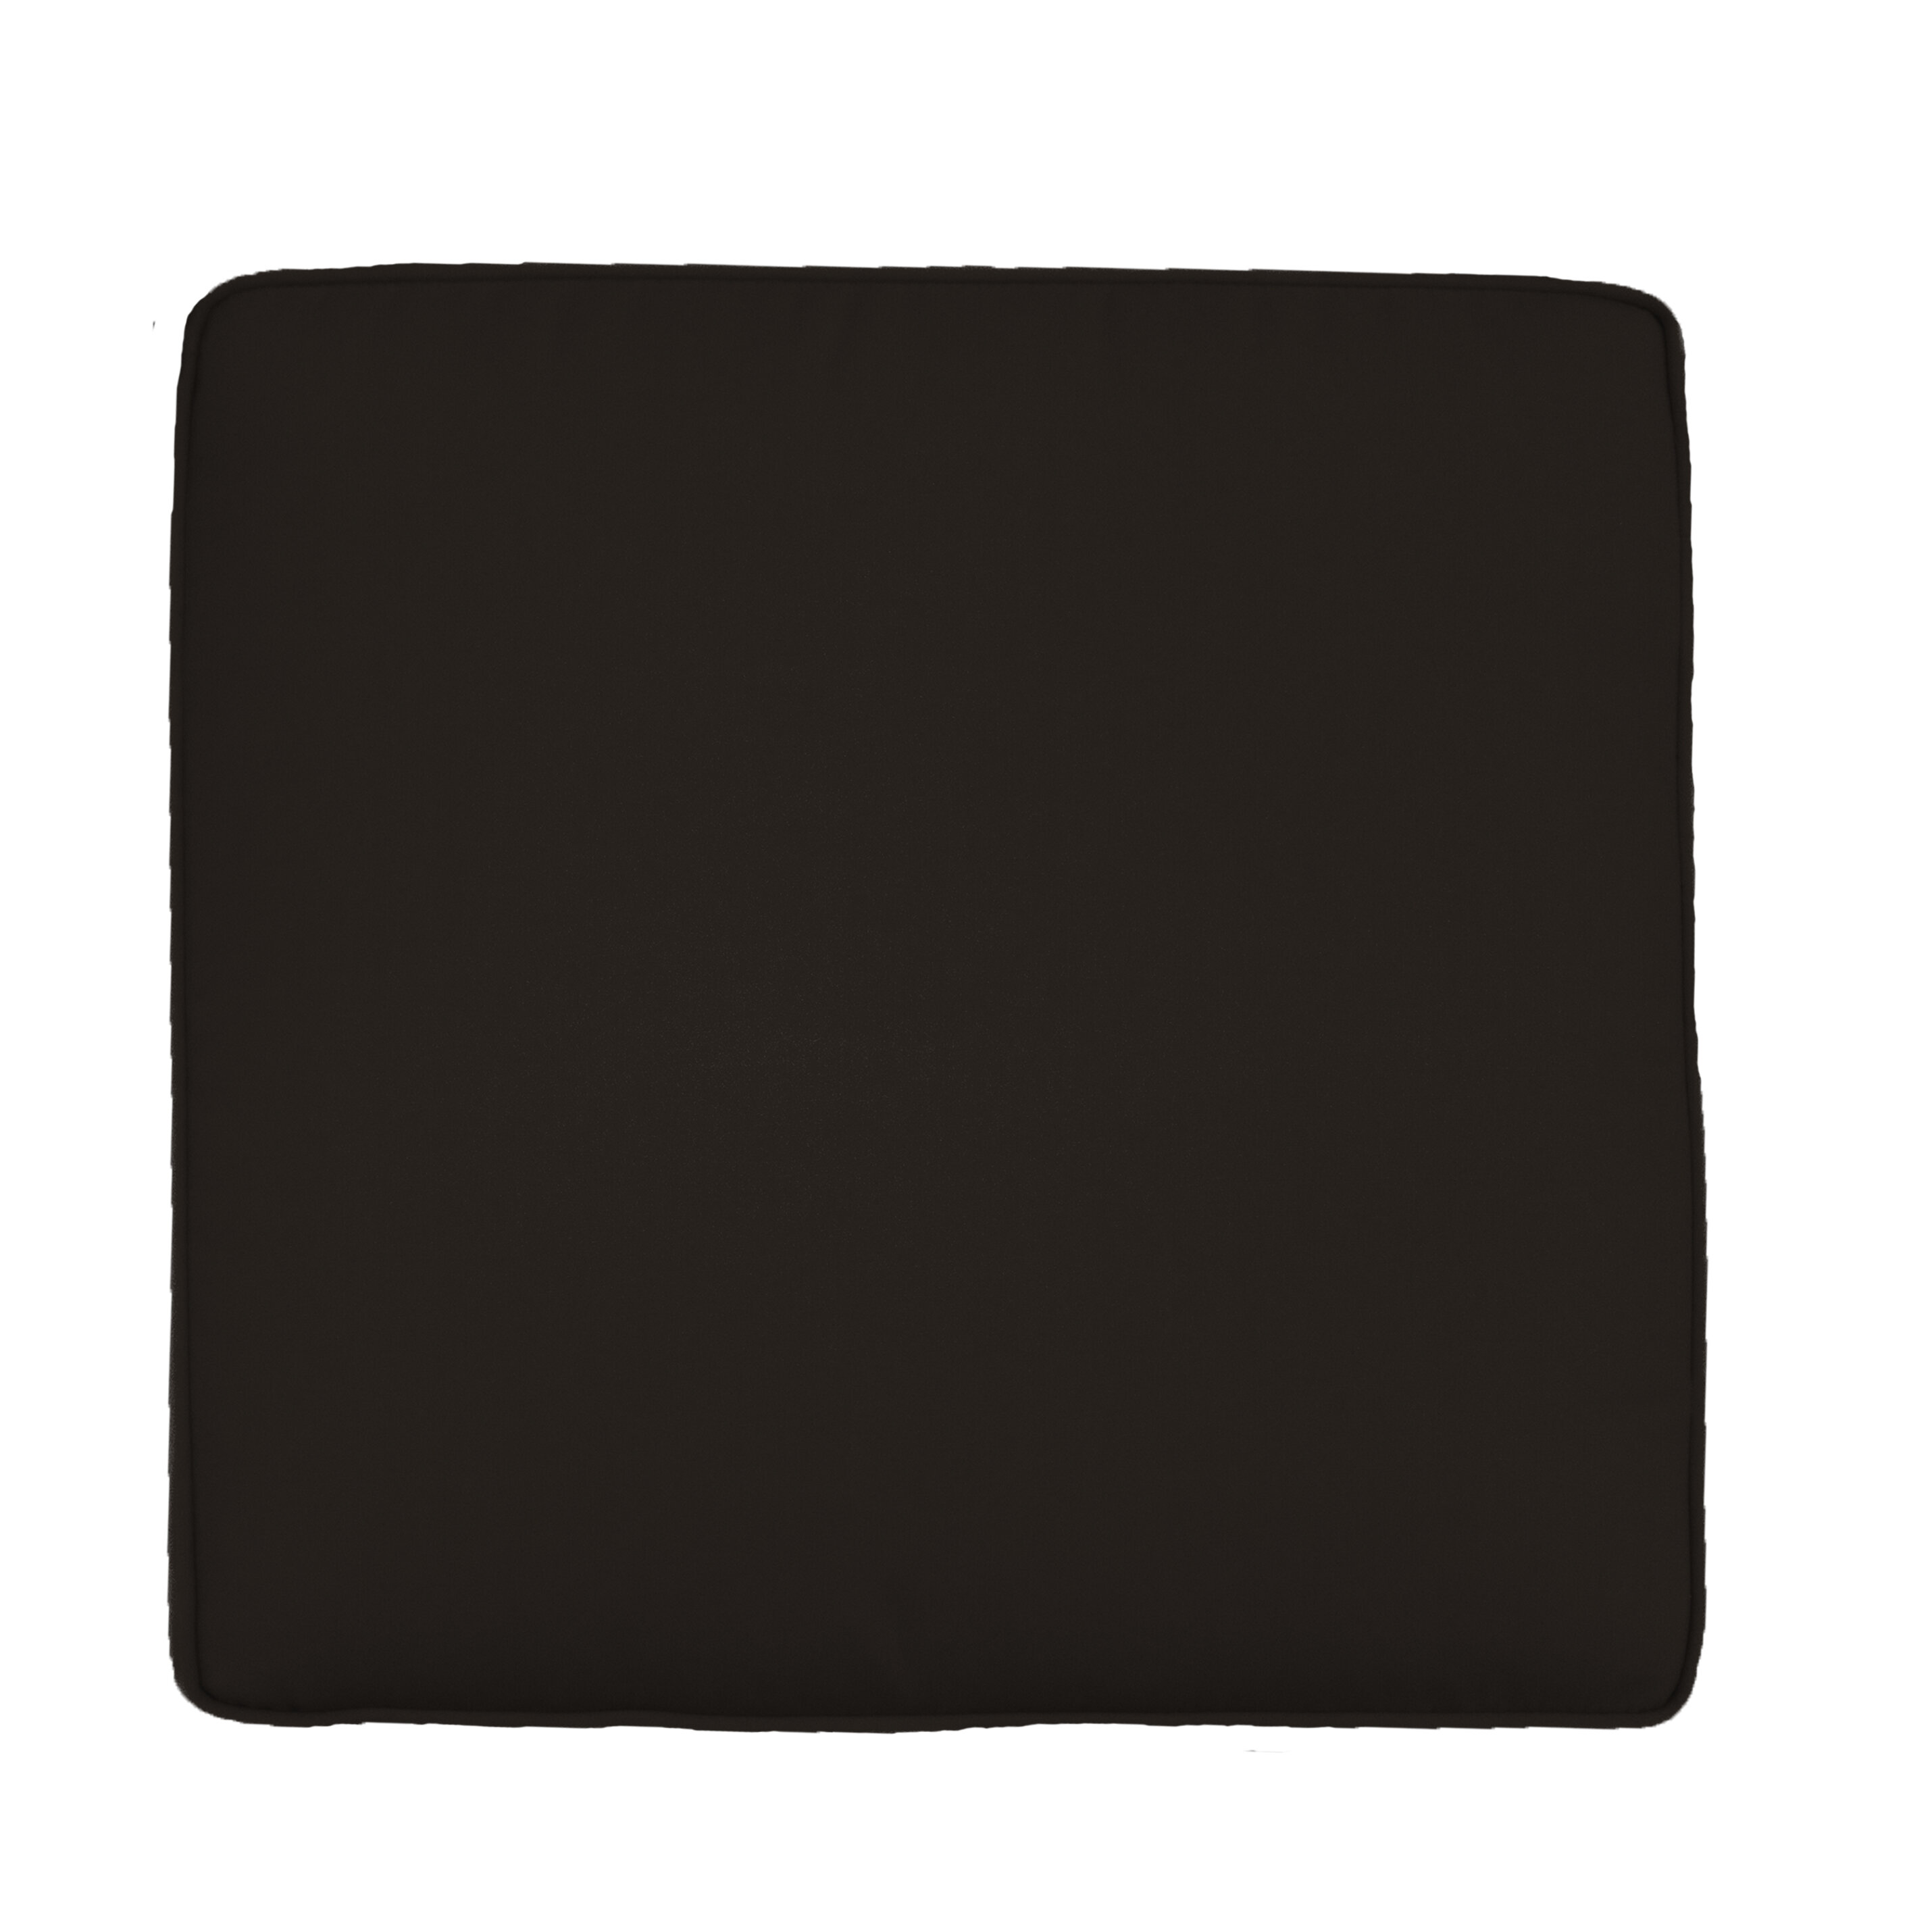 Wayfair Custom Outdoor Cushions Indoor/Outdoor Sunbrella Square Dining Chair  Cushion U0026 Reviews | Wayfair